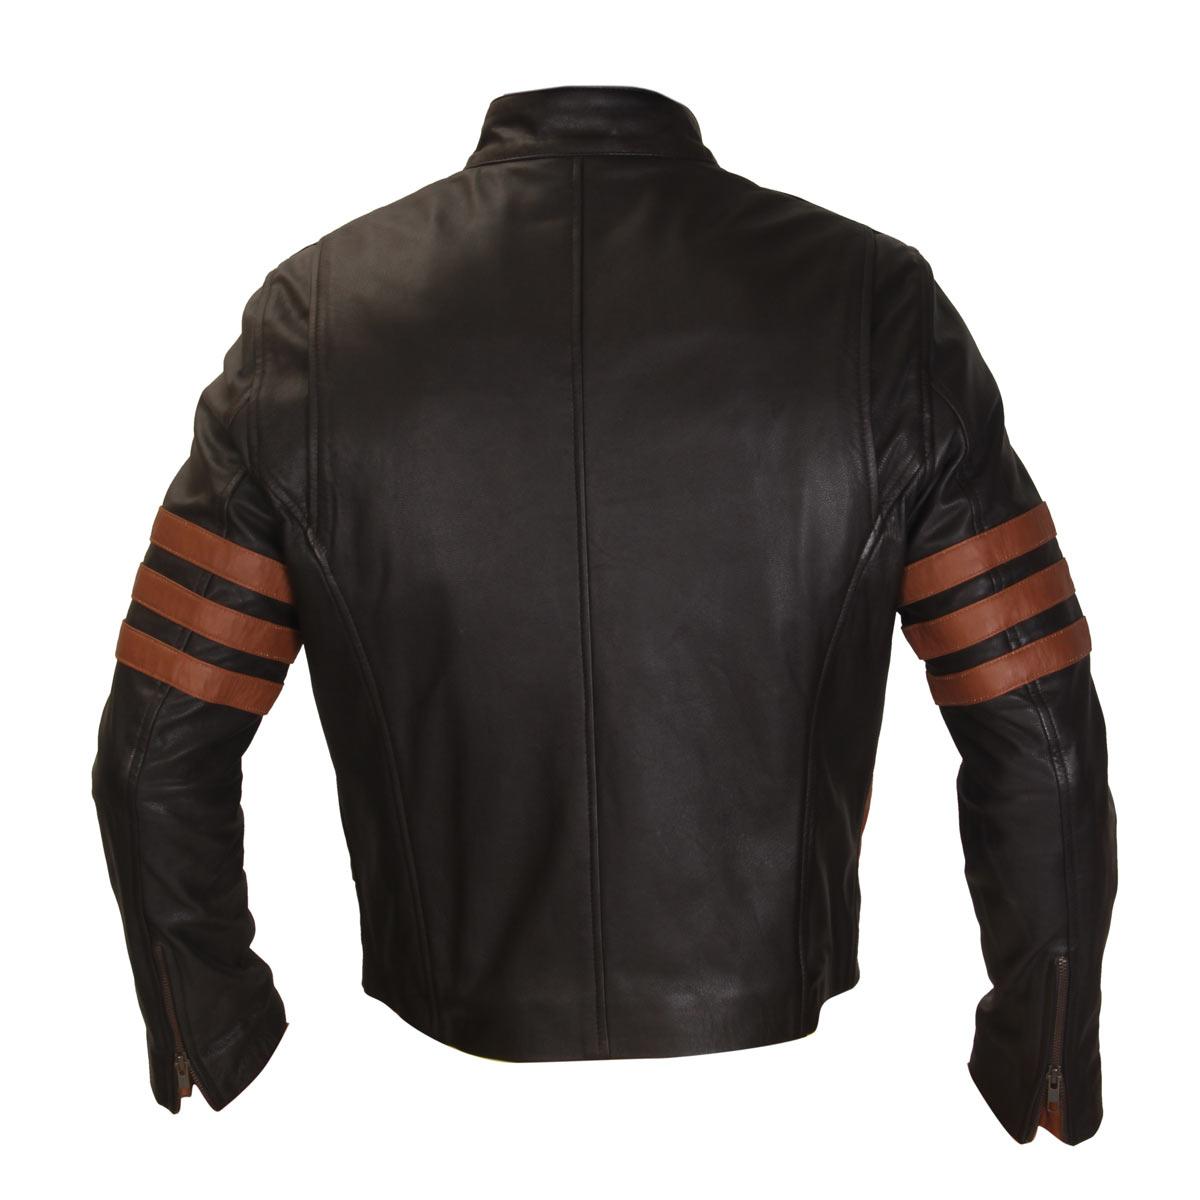 Leather jacket price